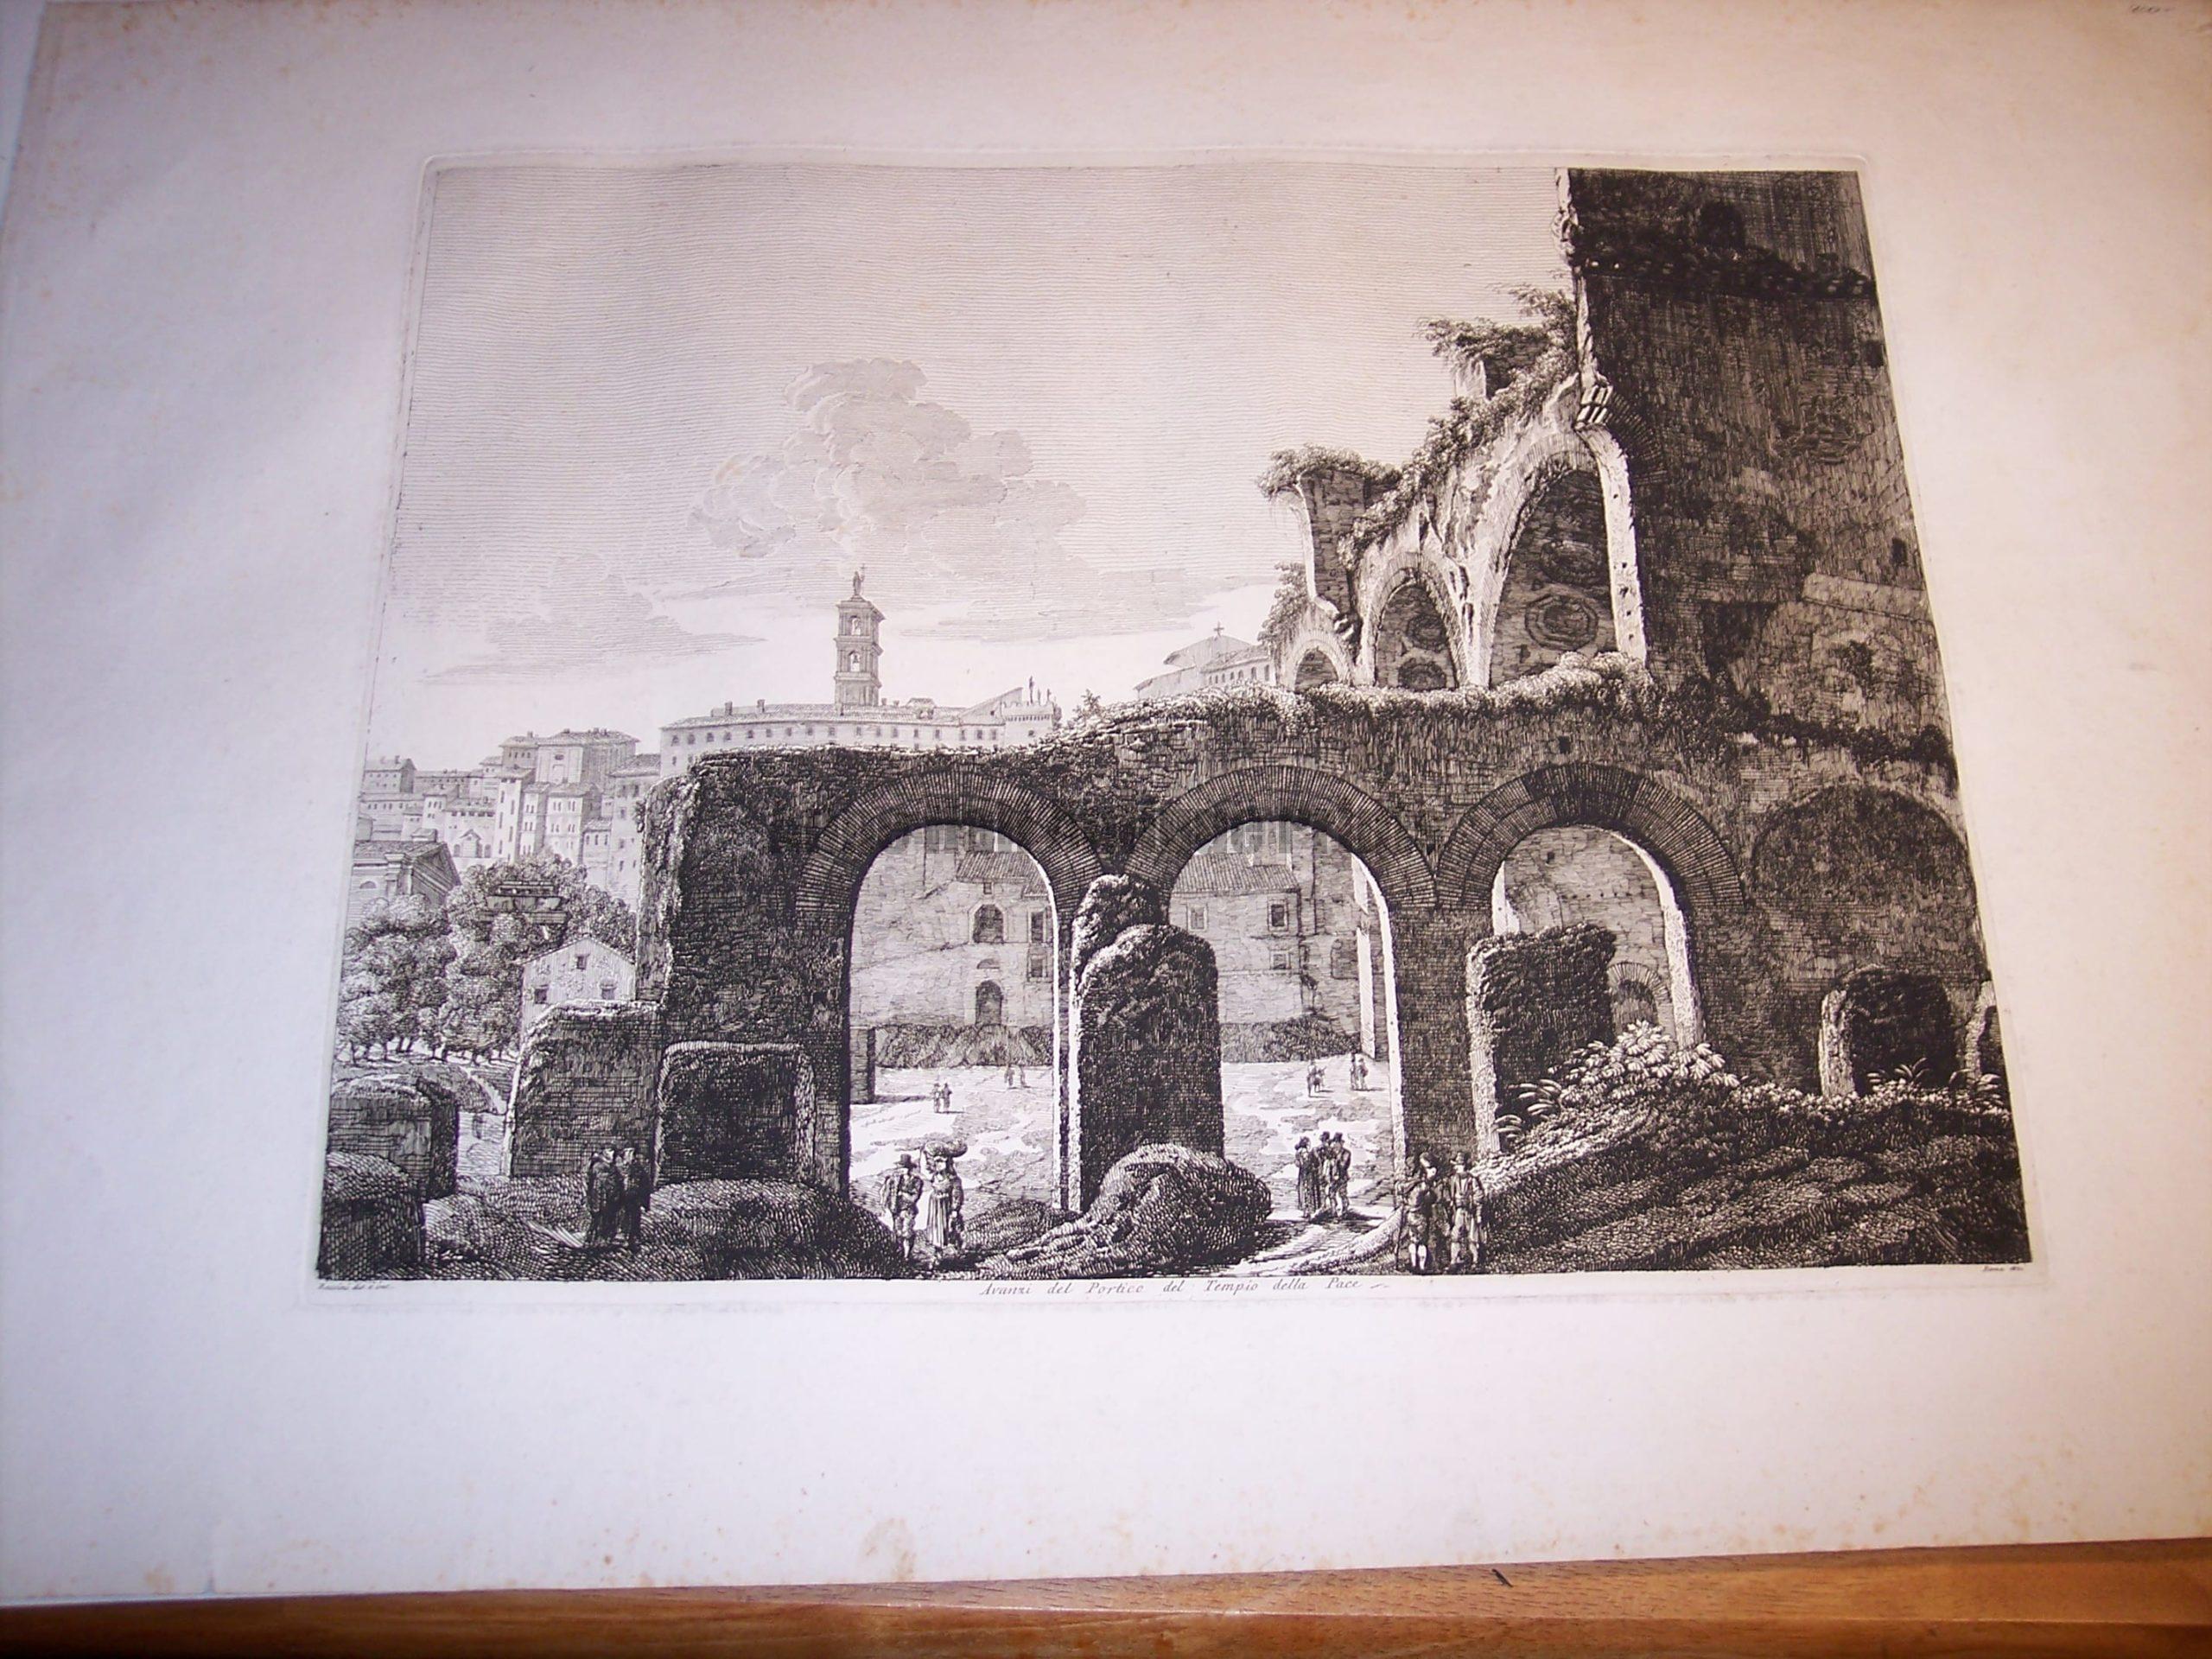 Rossini Engraving of Rome 8068